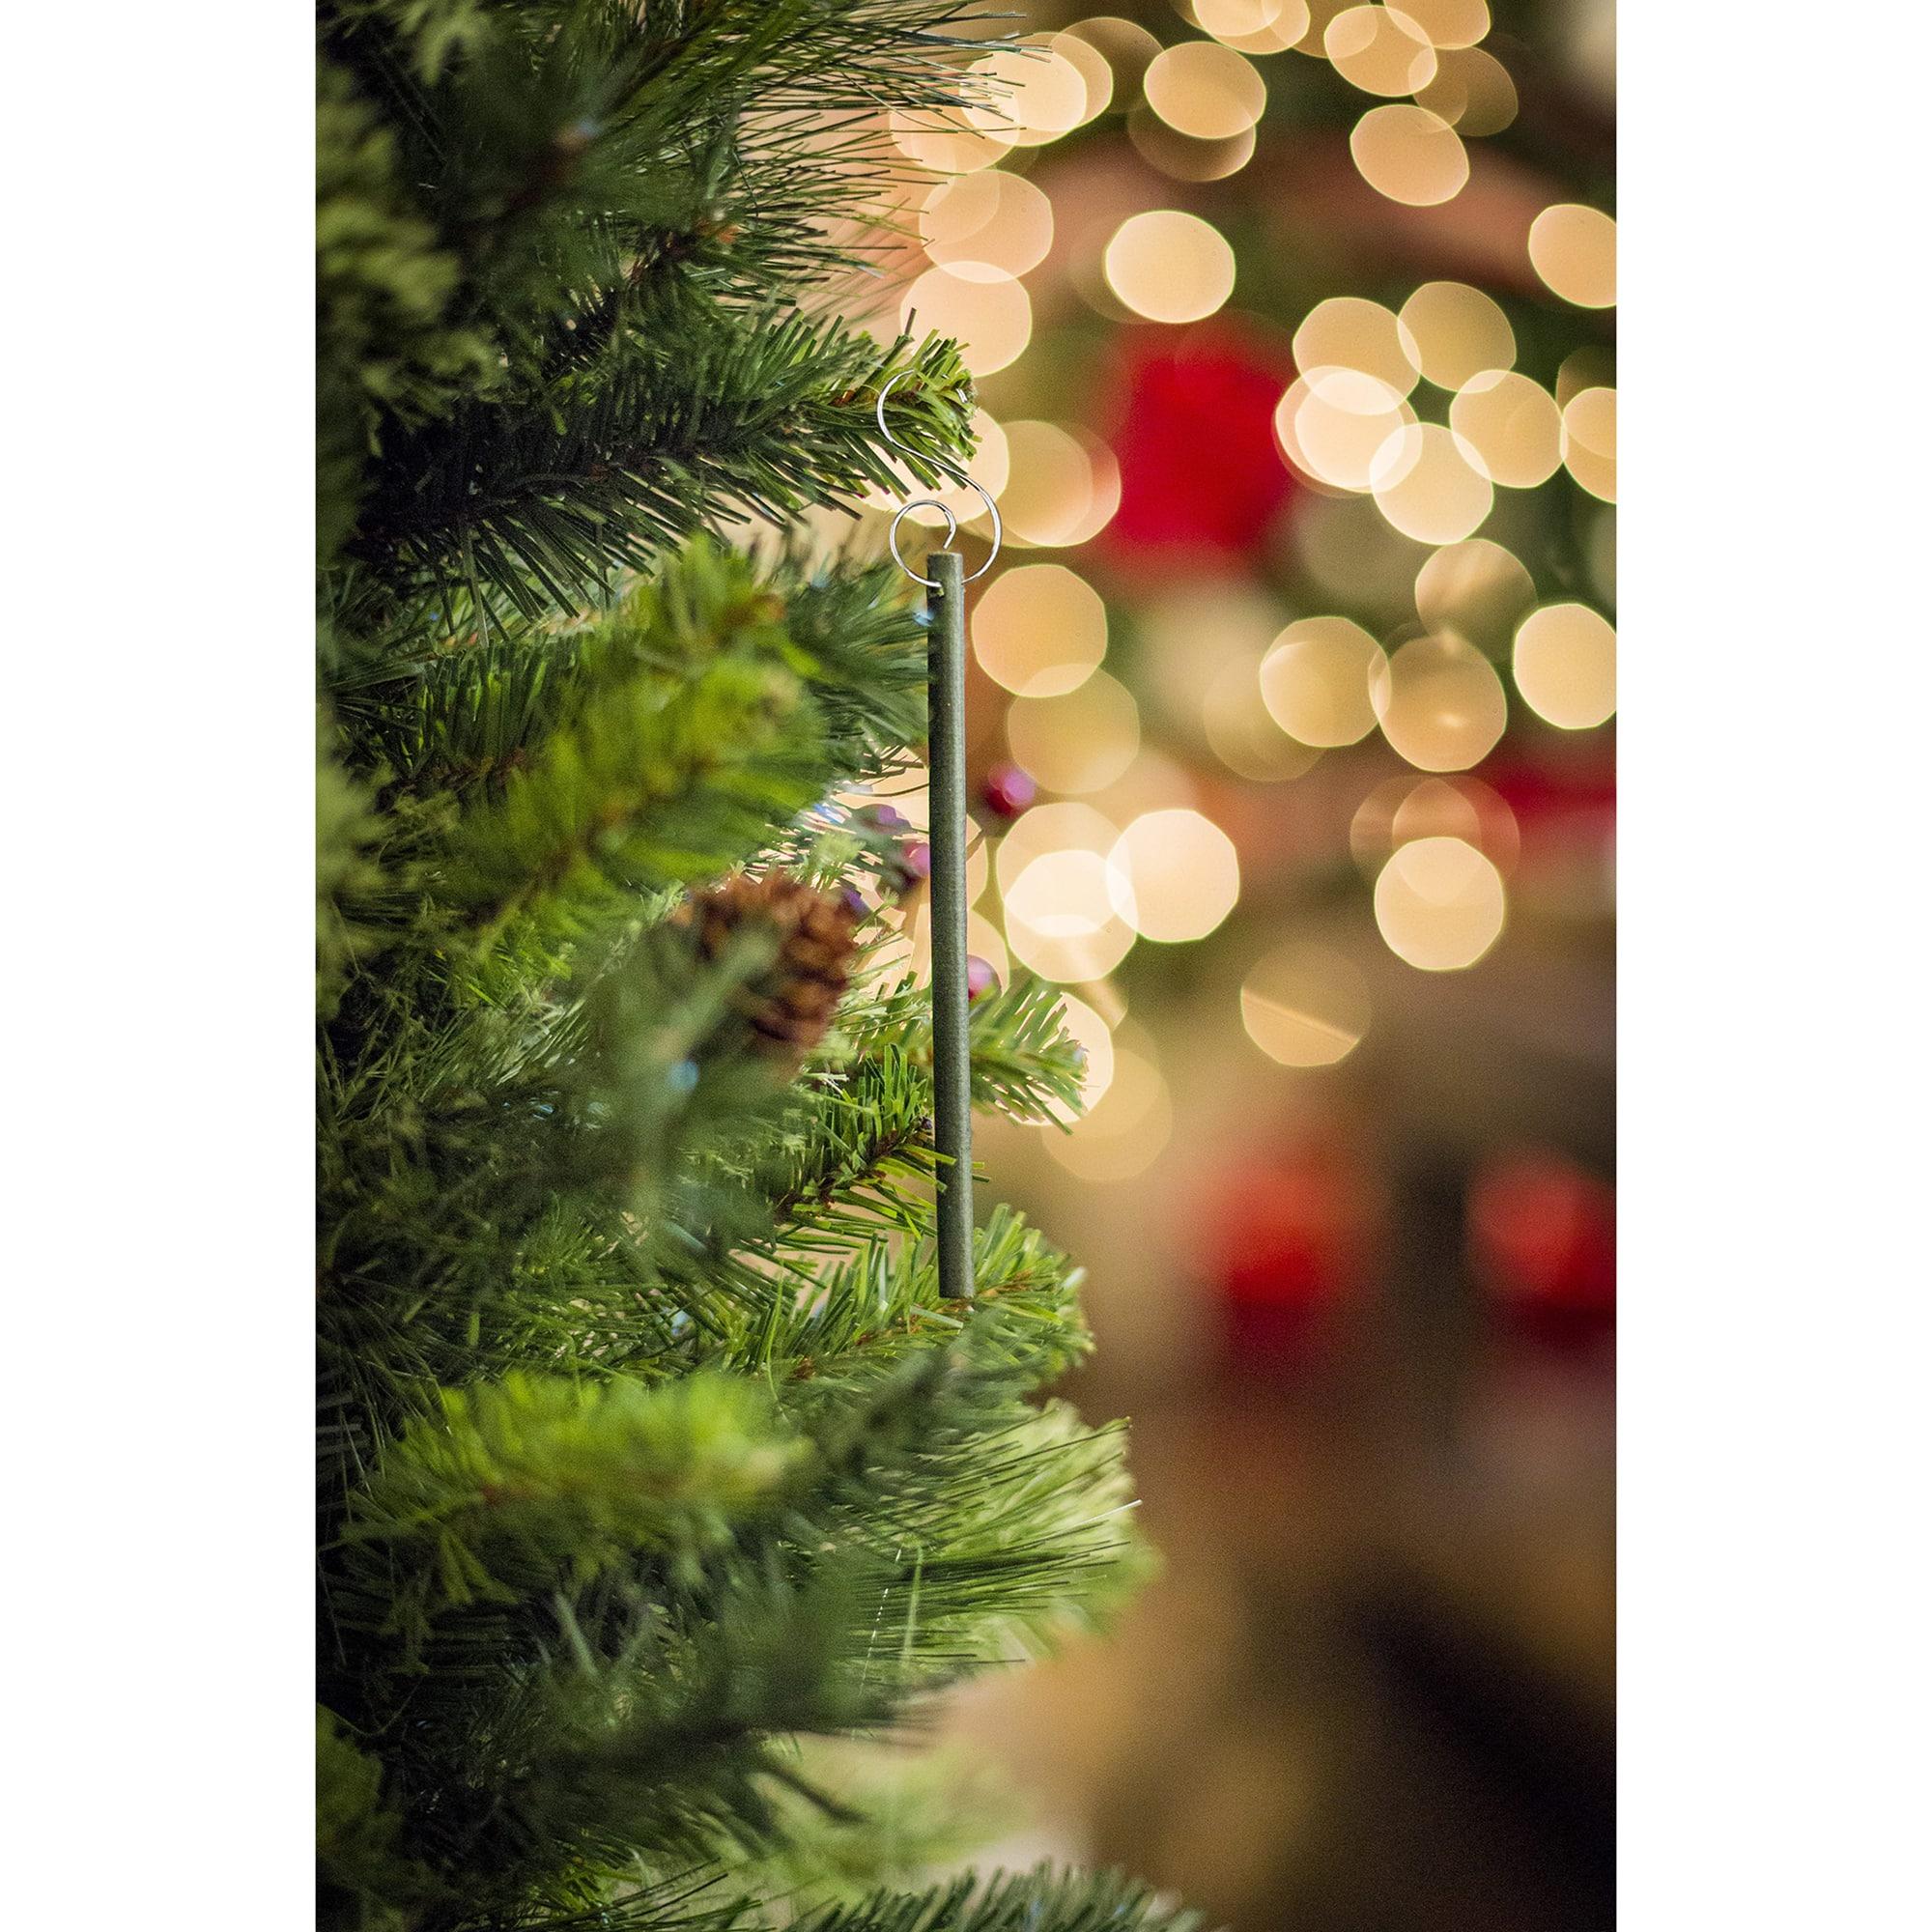 Multi 3 8 X 4 4 X 1 8 Swarovski Crystal Holiday Wreath Ornament Tree Decorations Home Garden Store